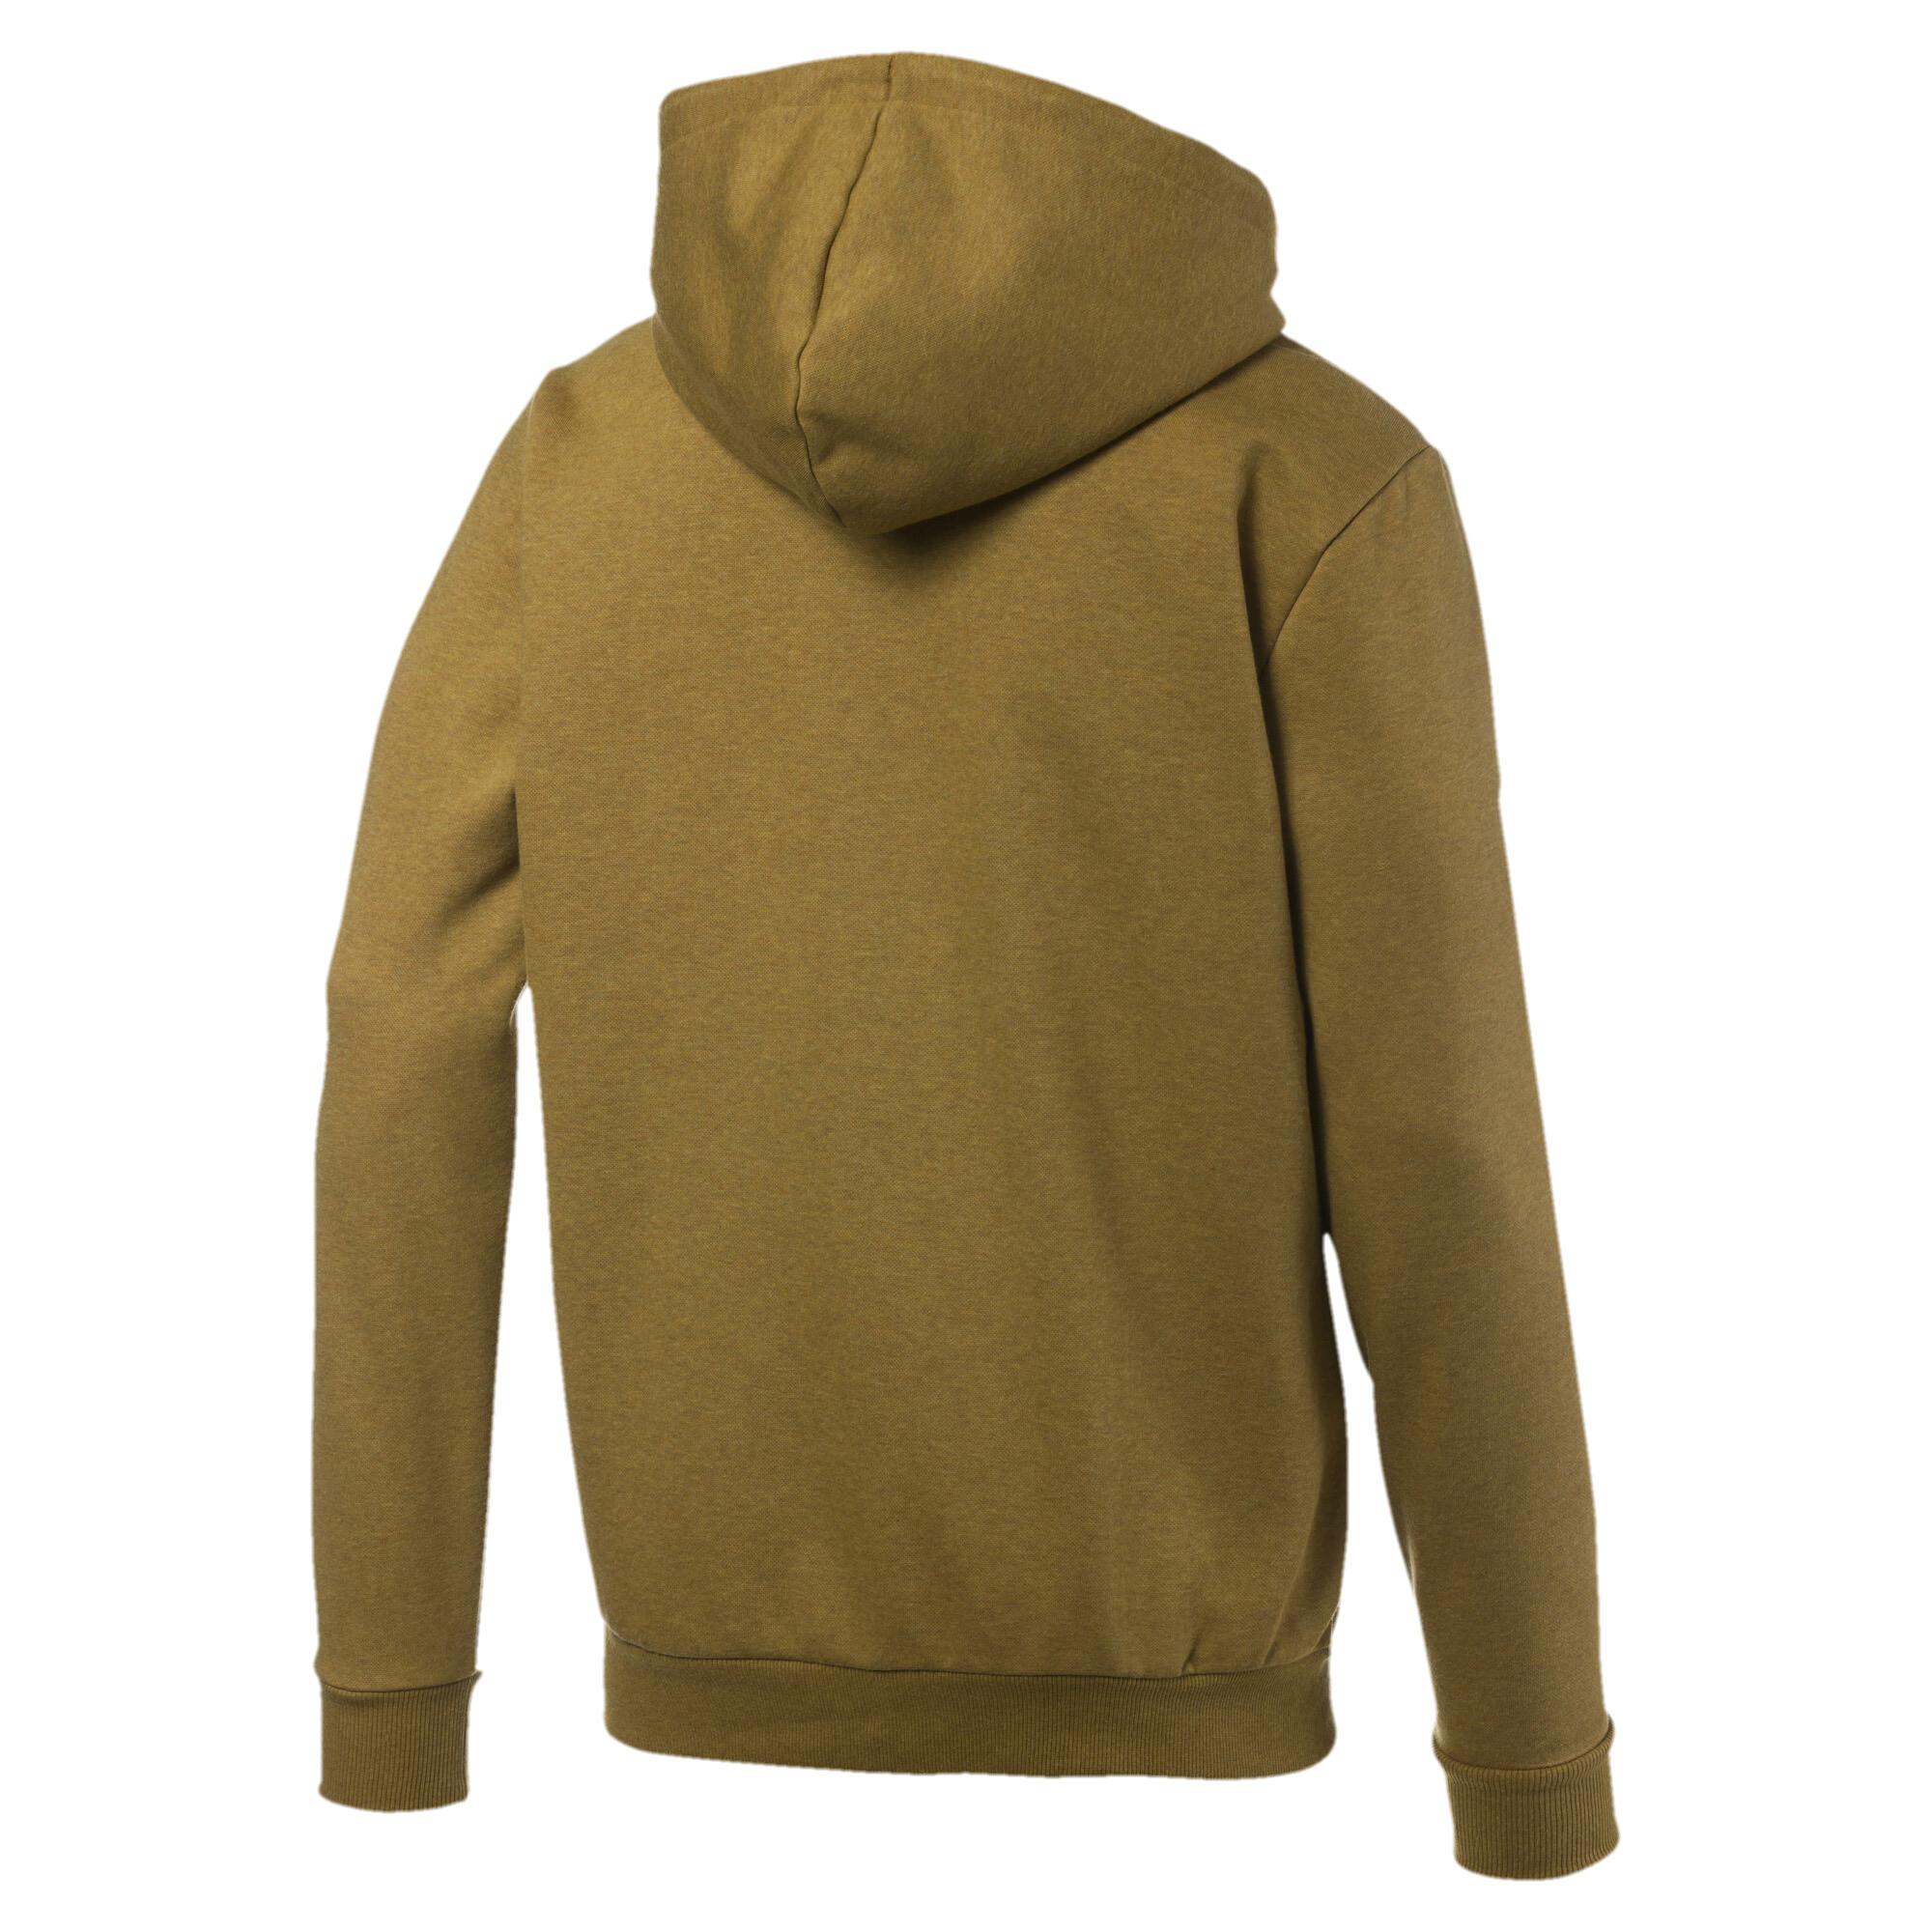 PUMA-Essentials-Men-039-s-Fleece-Hooded-Jacket-Men-Sweat-Basics thumbnail 21